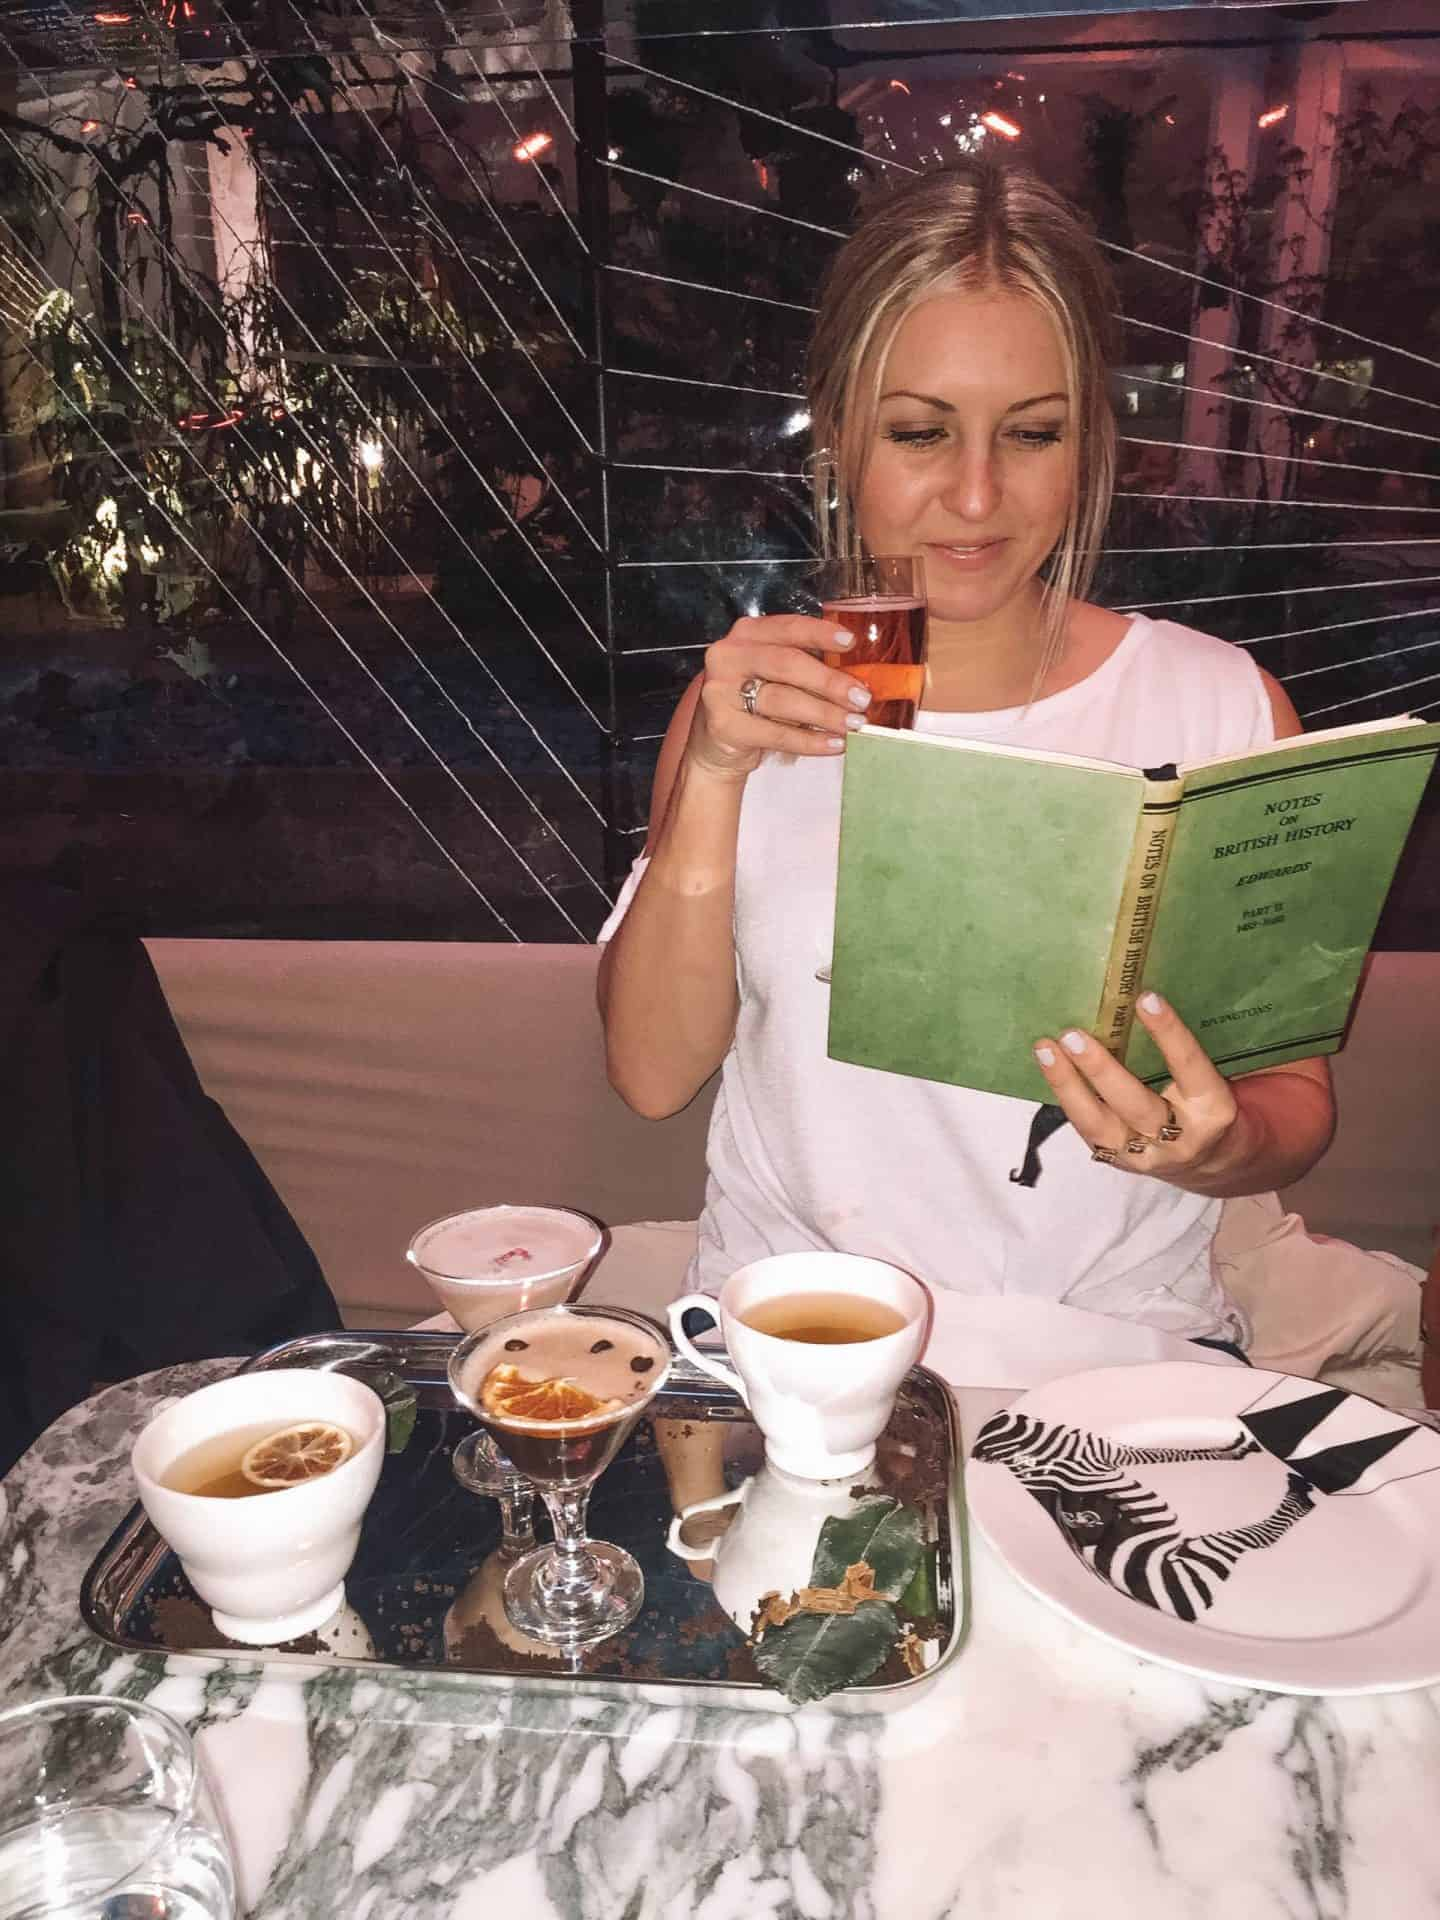 afternoon tea spread